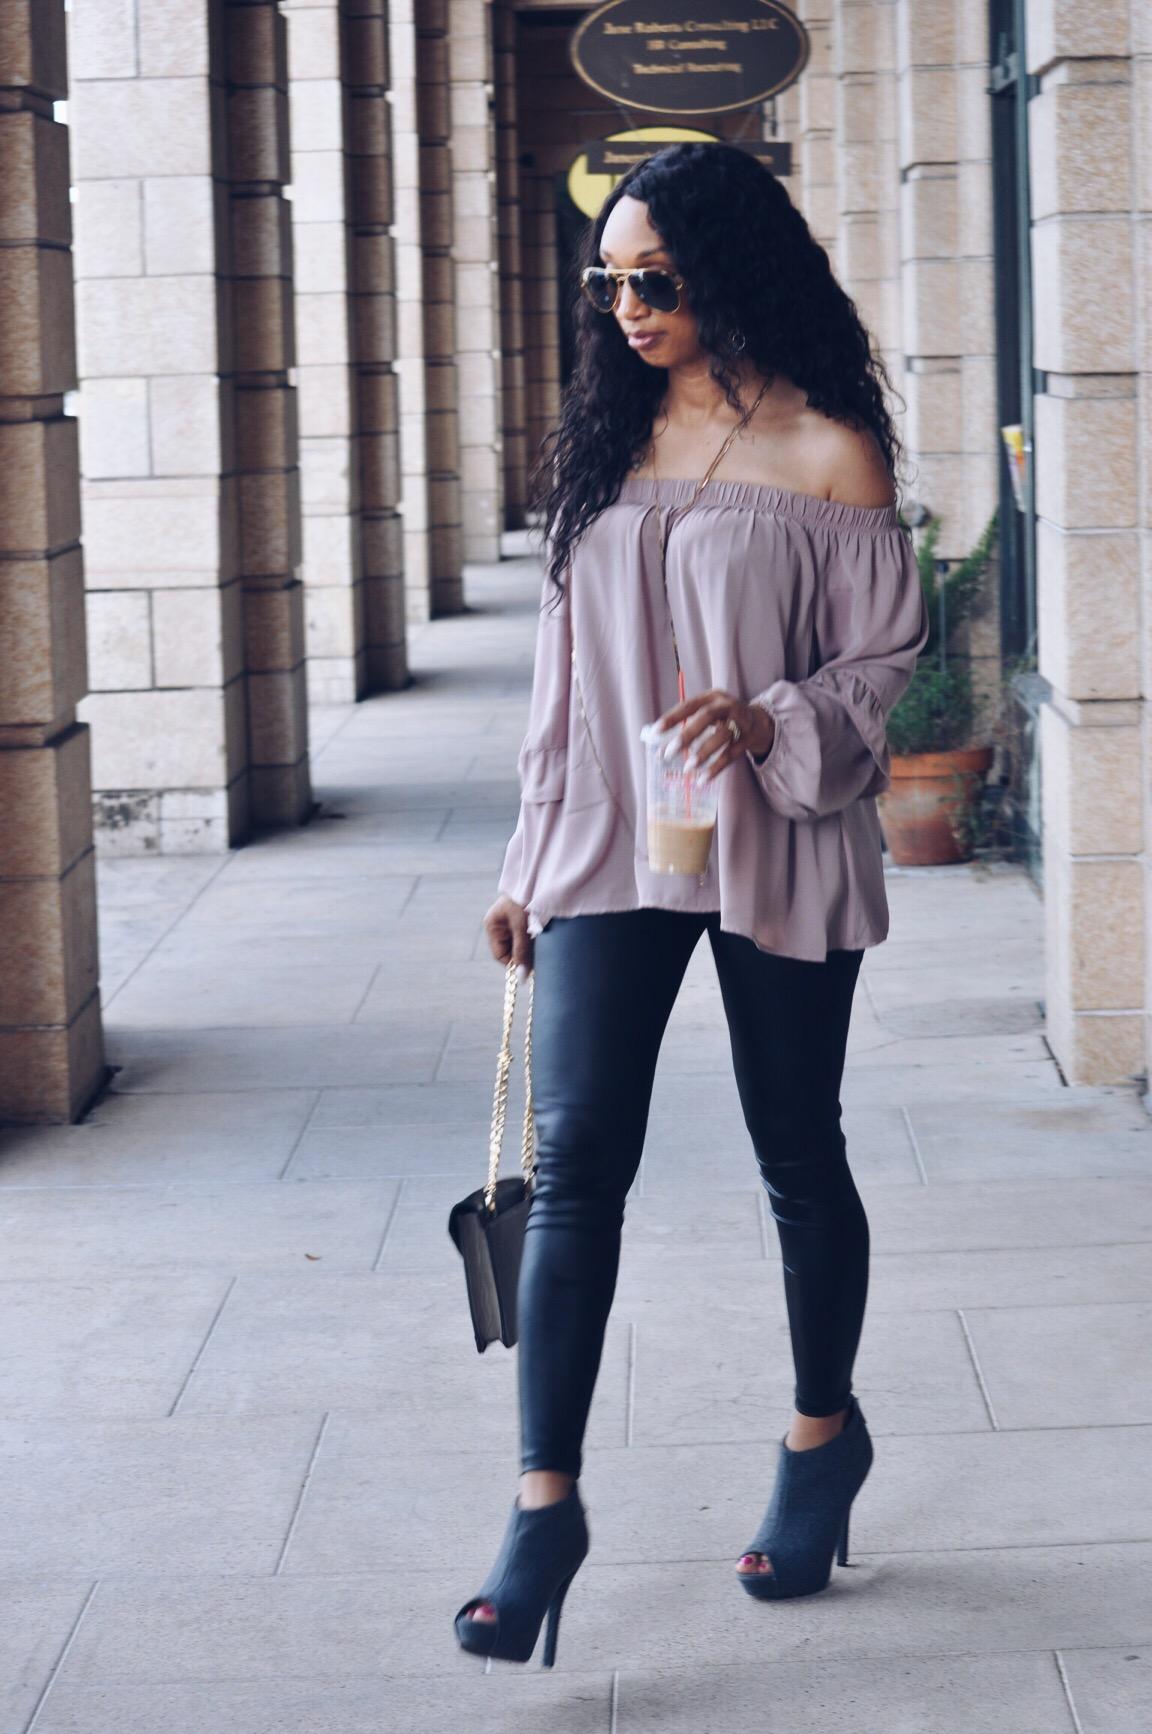 no longer a beauty and fashion blogger